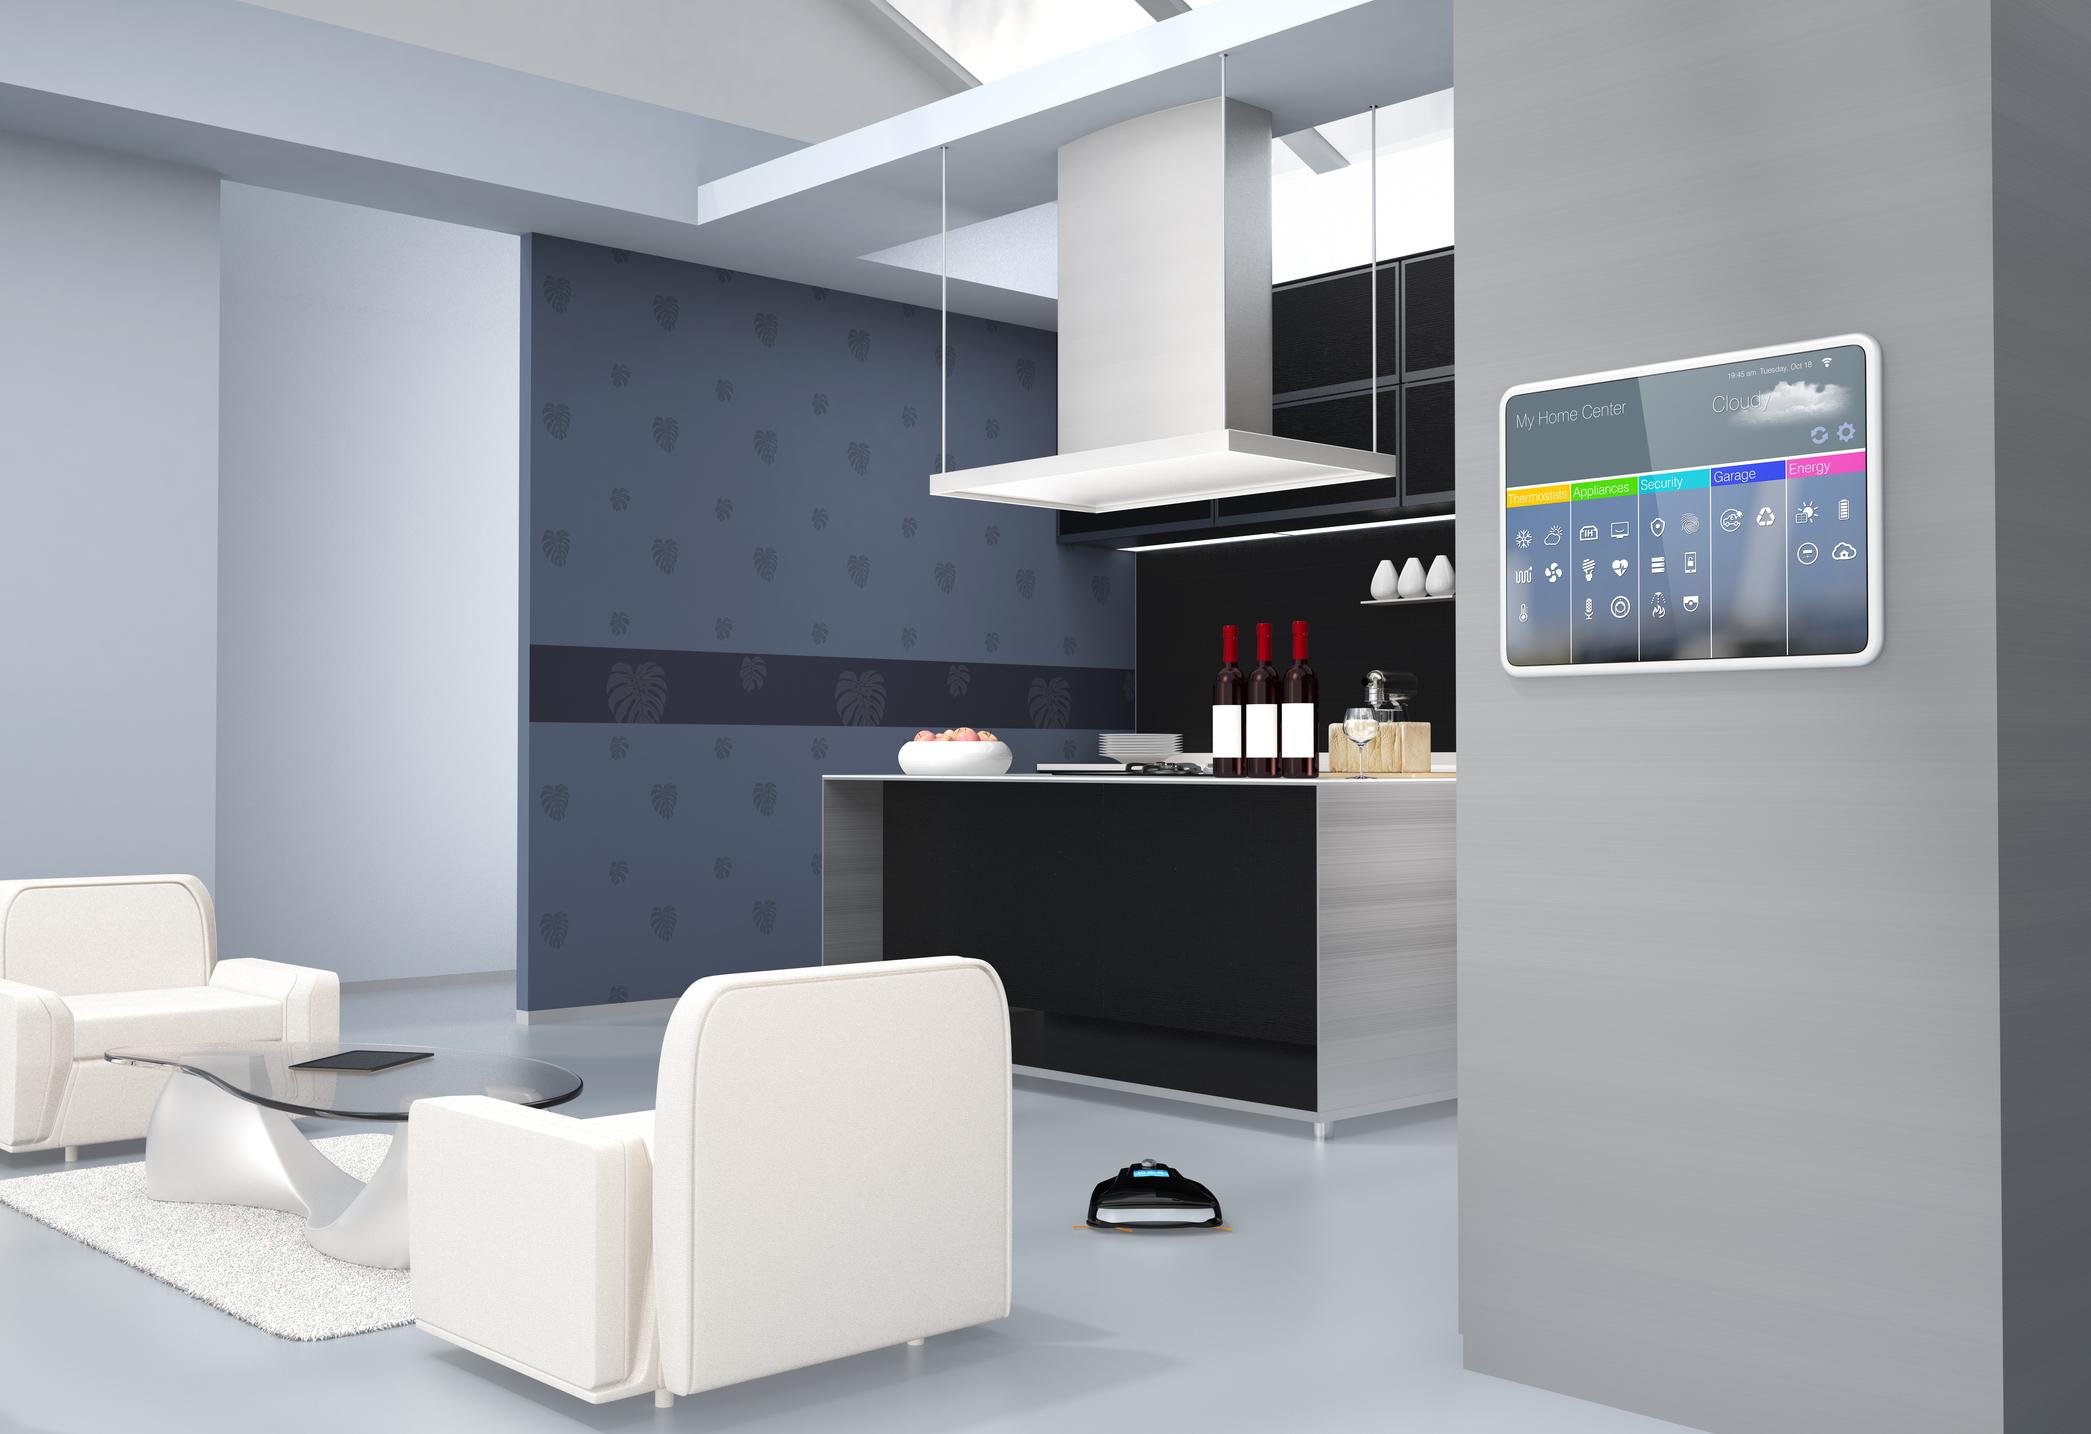 """The Jetsons"" Comes True: Inside the Futuristic Smart Home ..."